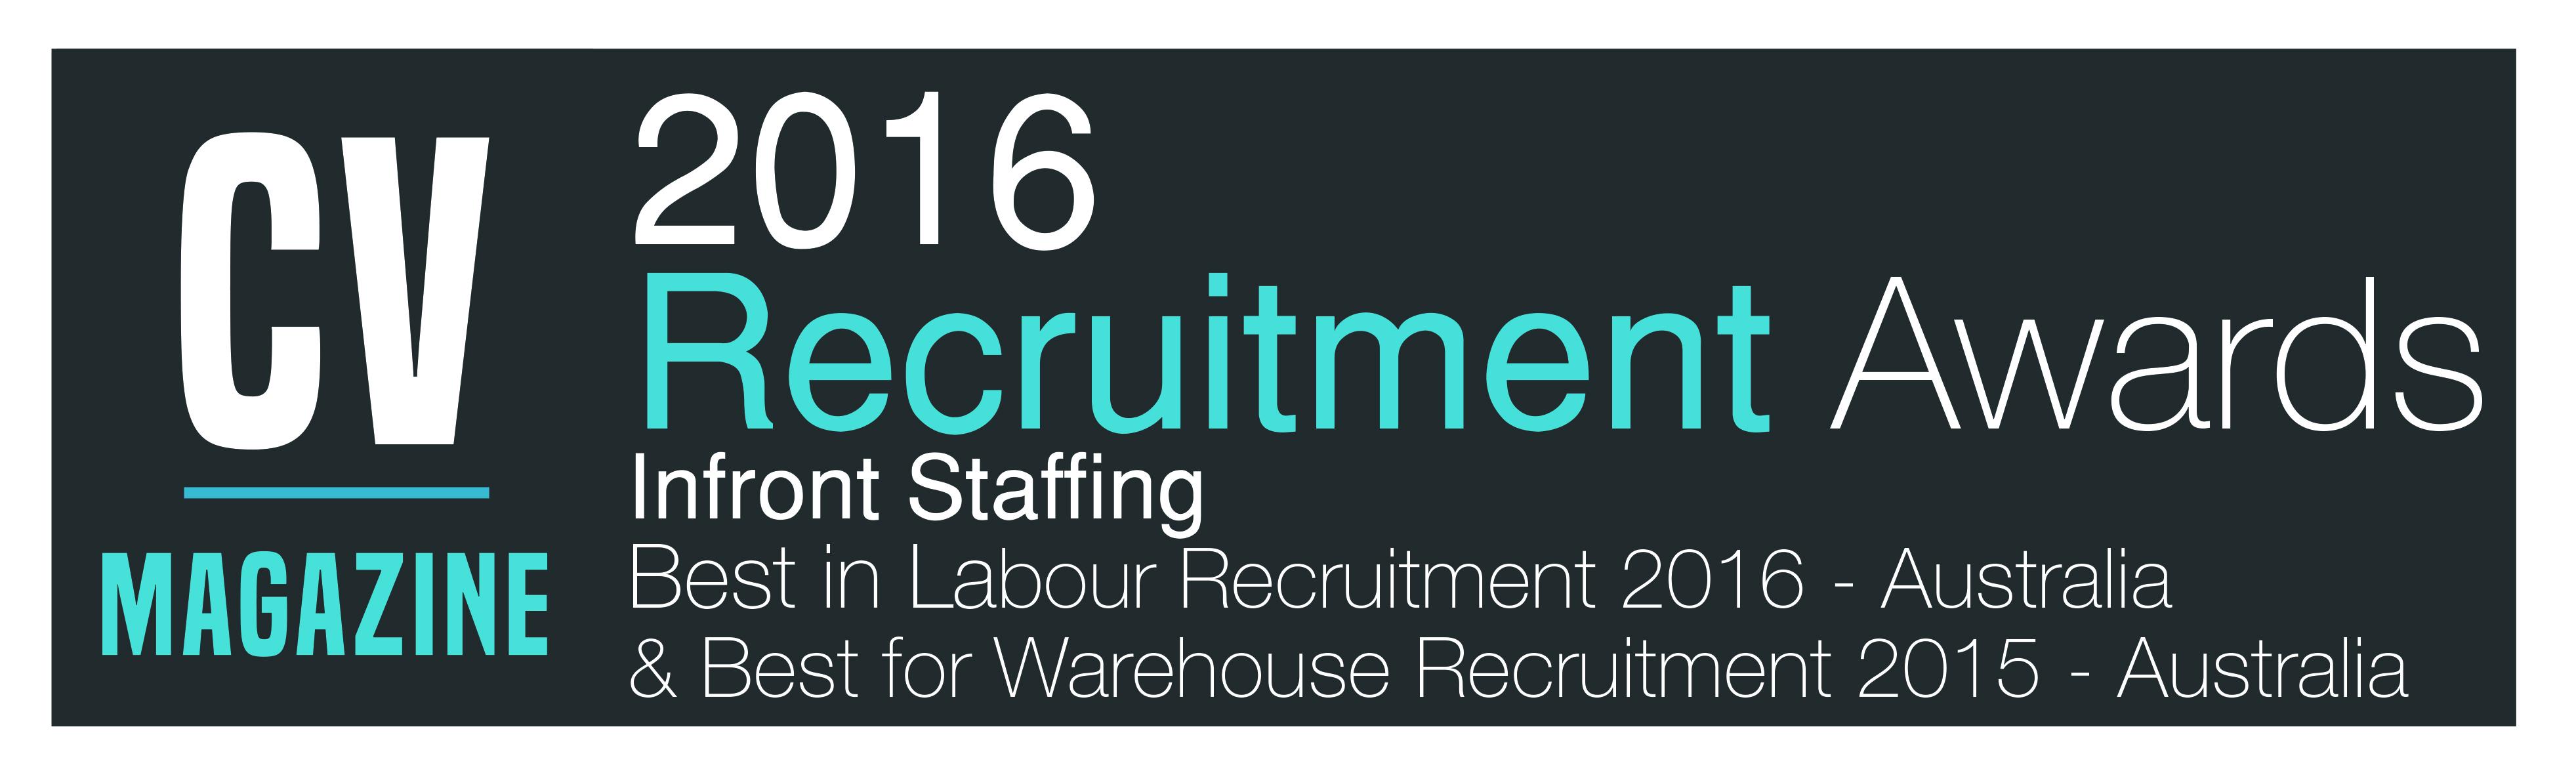 Infront Staffing-Recruitment Awards 2016 (RE160006) Winners Logo